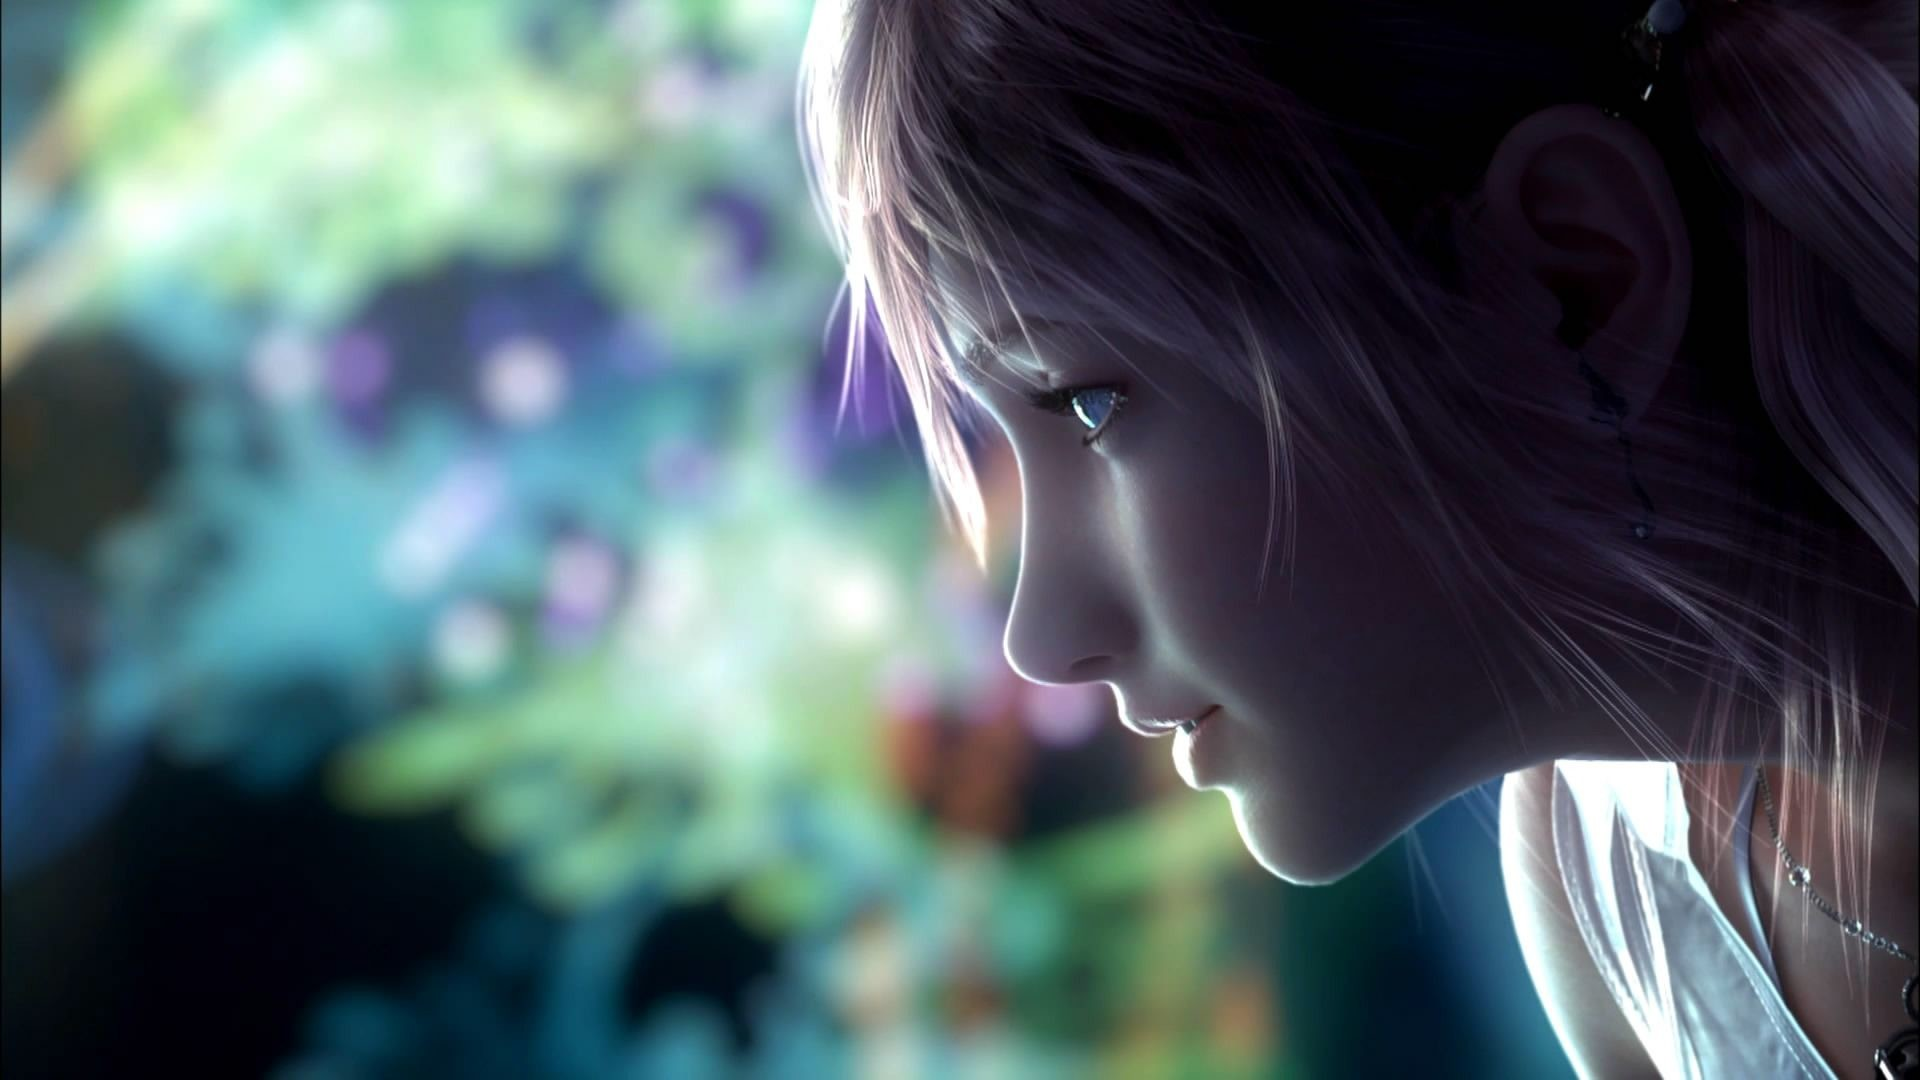 Final Fantasy XV HD Wallpapers Backgrounds Wallpaper